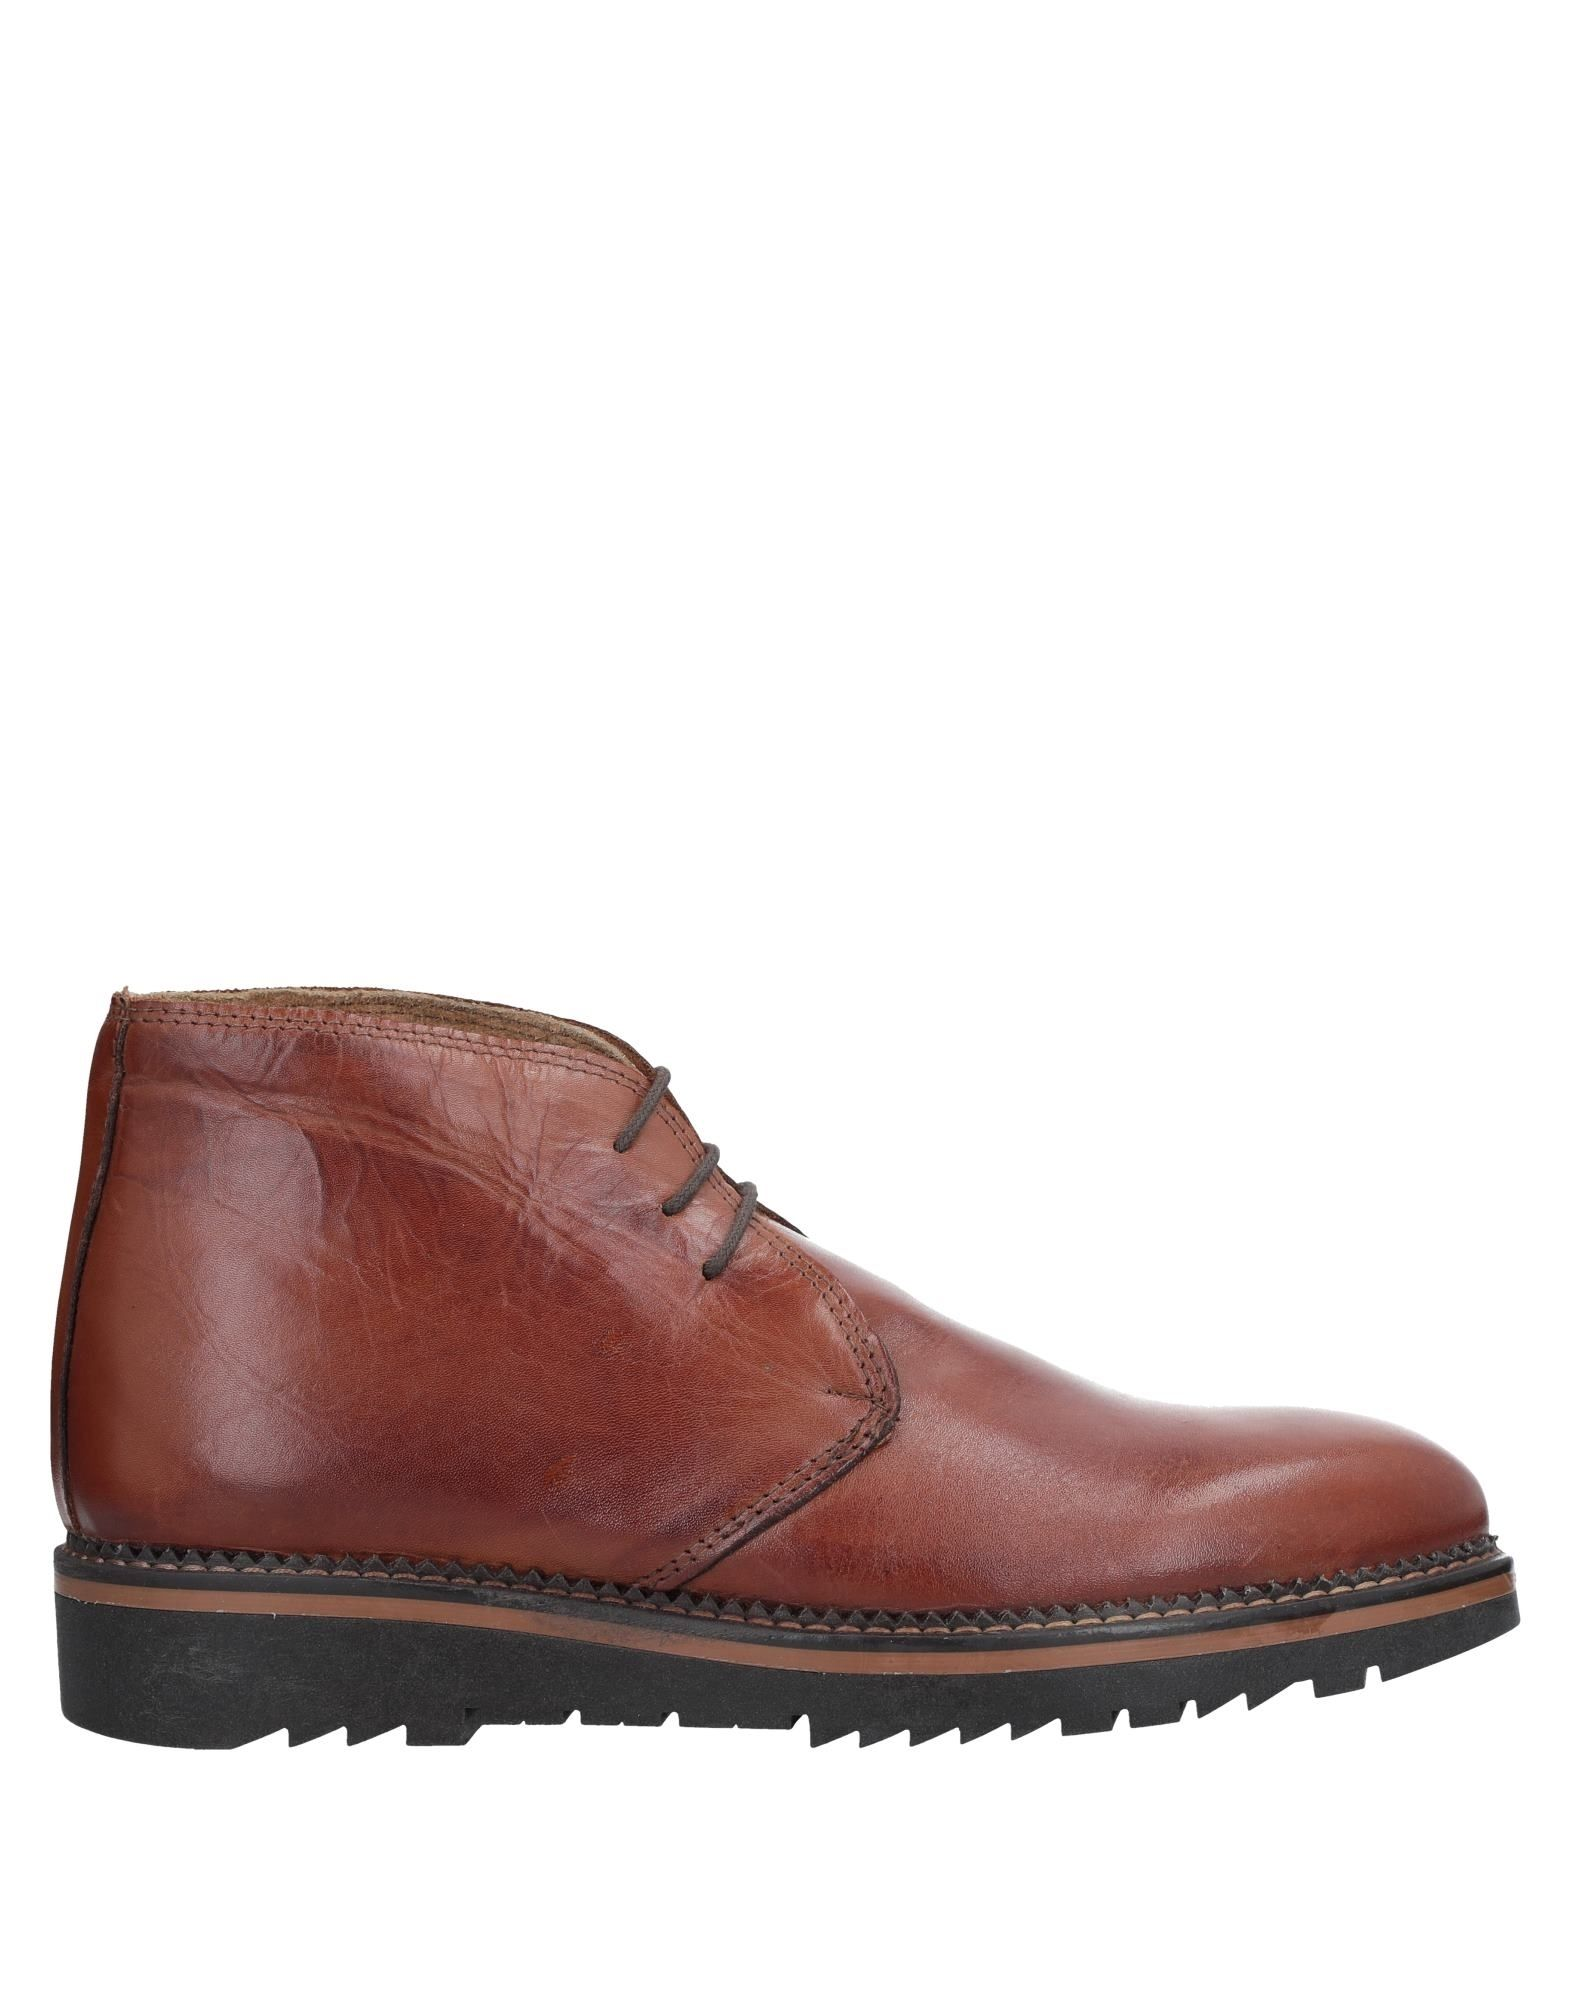 Rabatt echte Schuhe Roberto Della Croce Stiefelette Herren  11531623AP